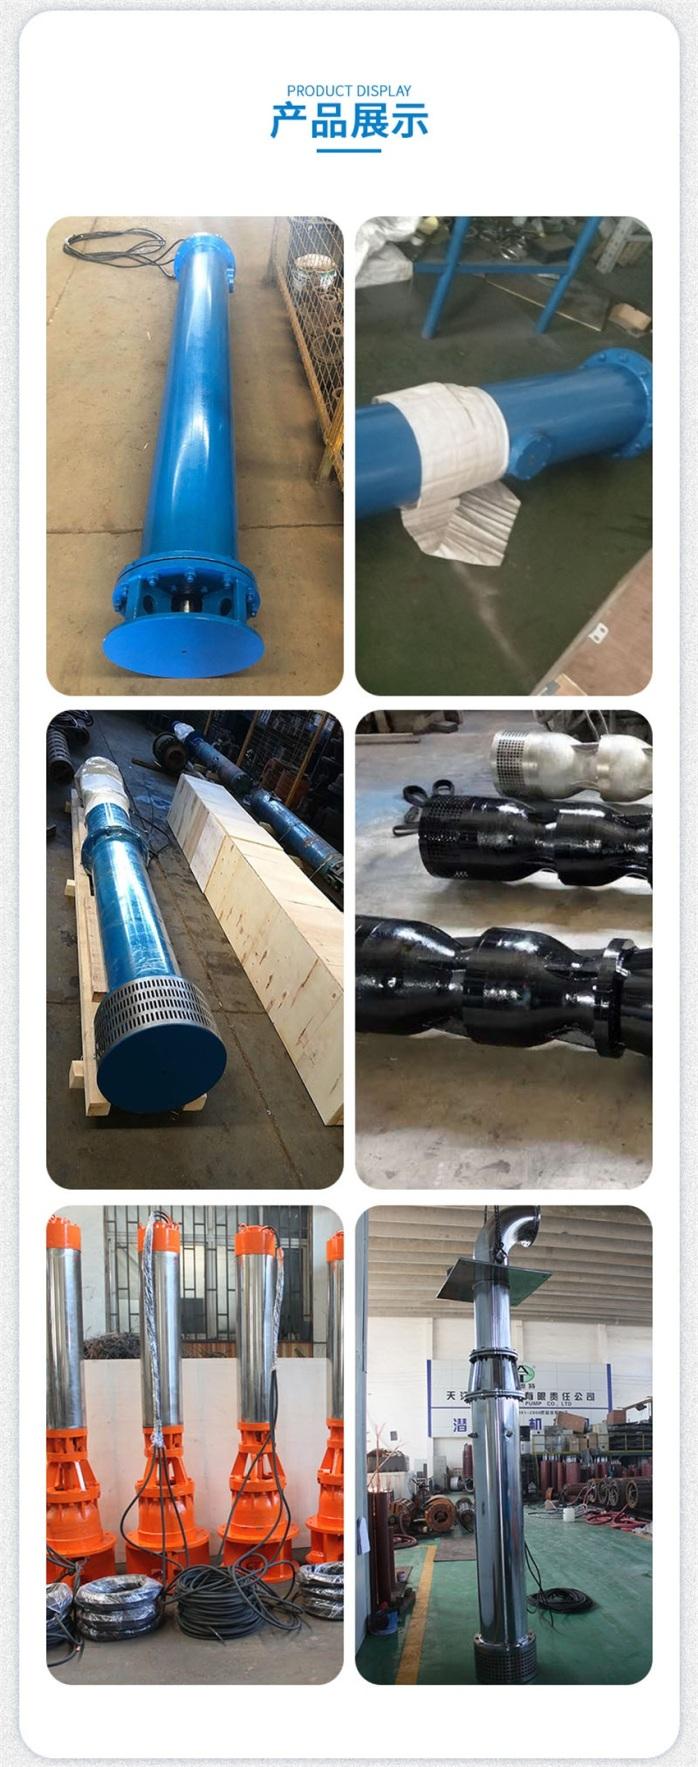 QJX下吸式潜水泵,大功率底吸水泵,抽水潜水泵厂家139446572